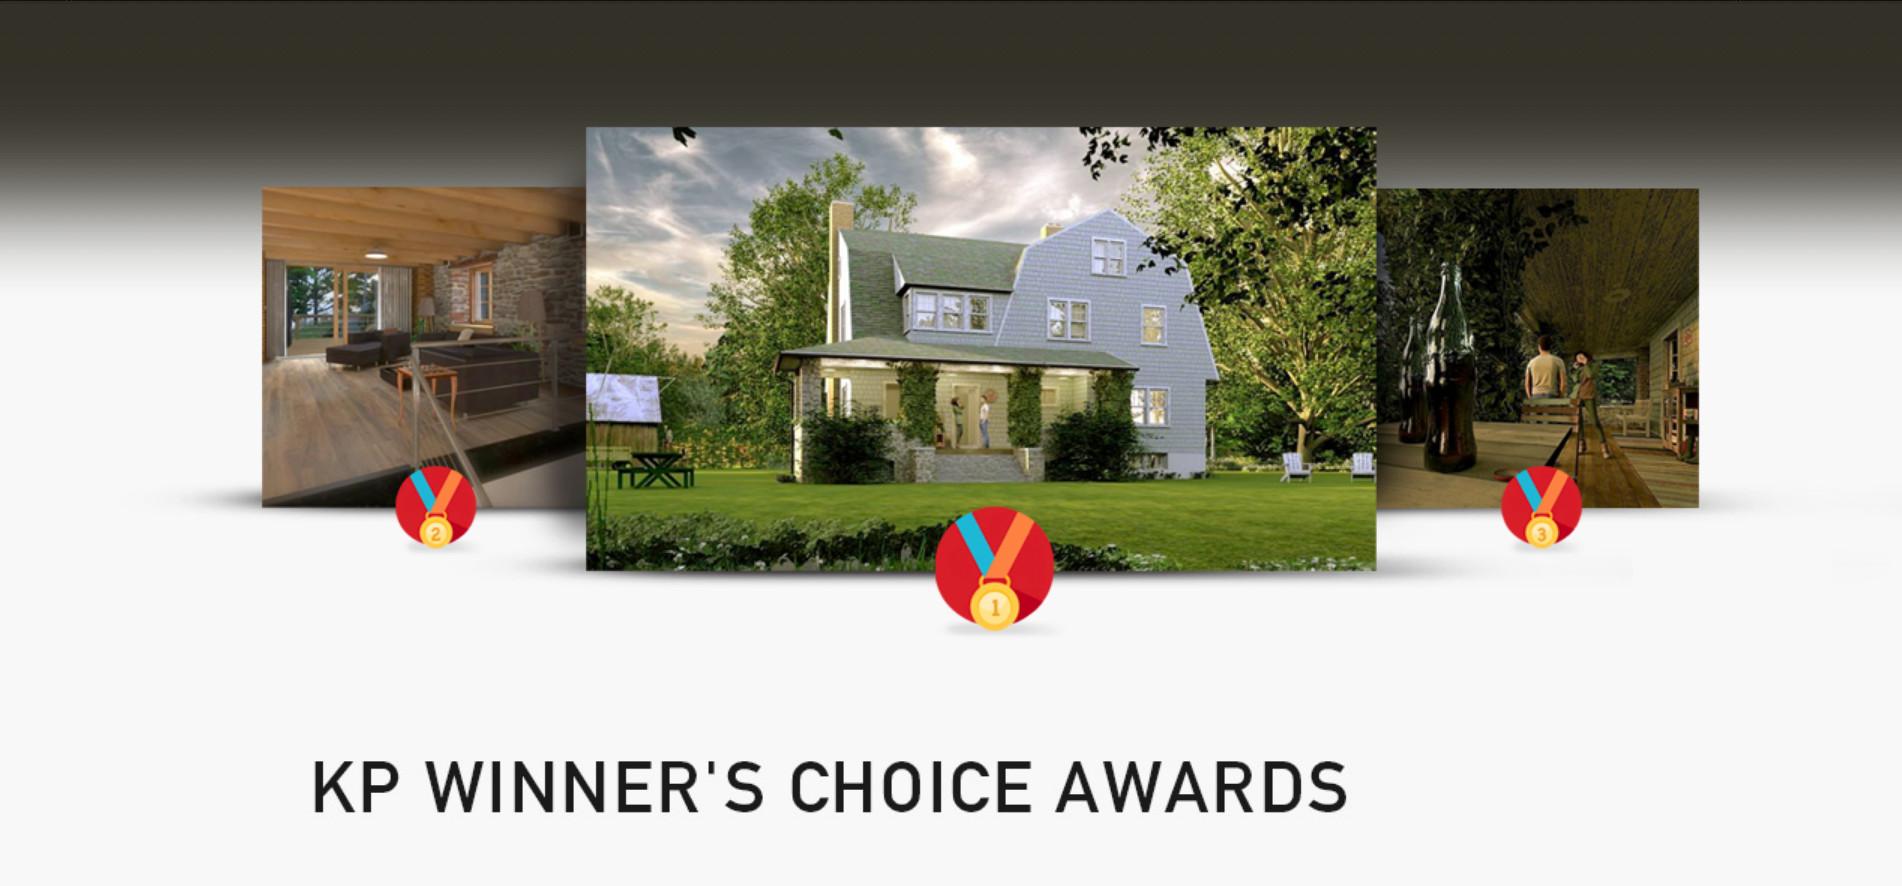 Duane kemp kp winner s choice awards